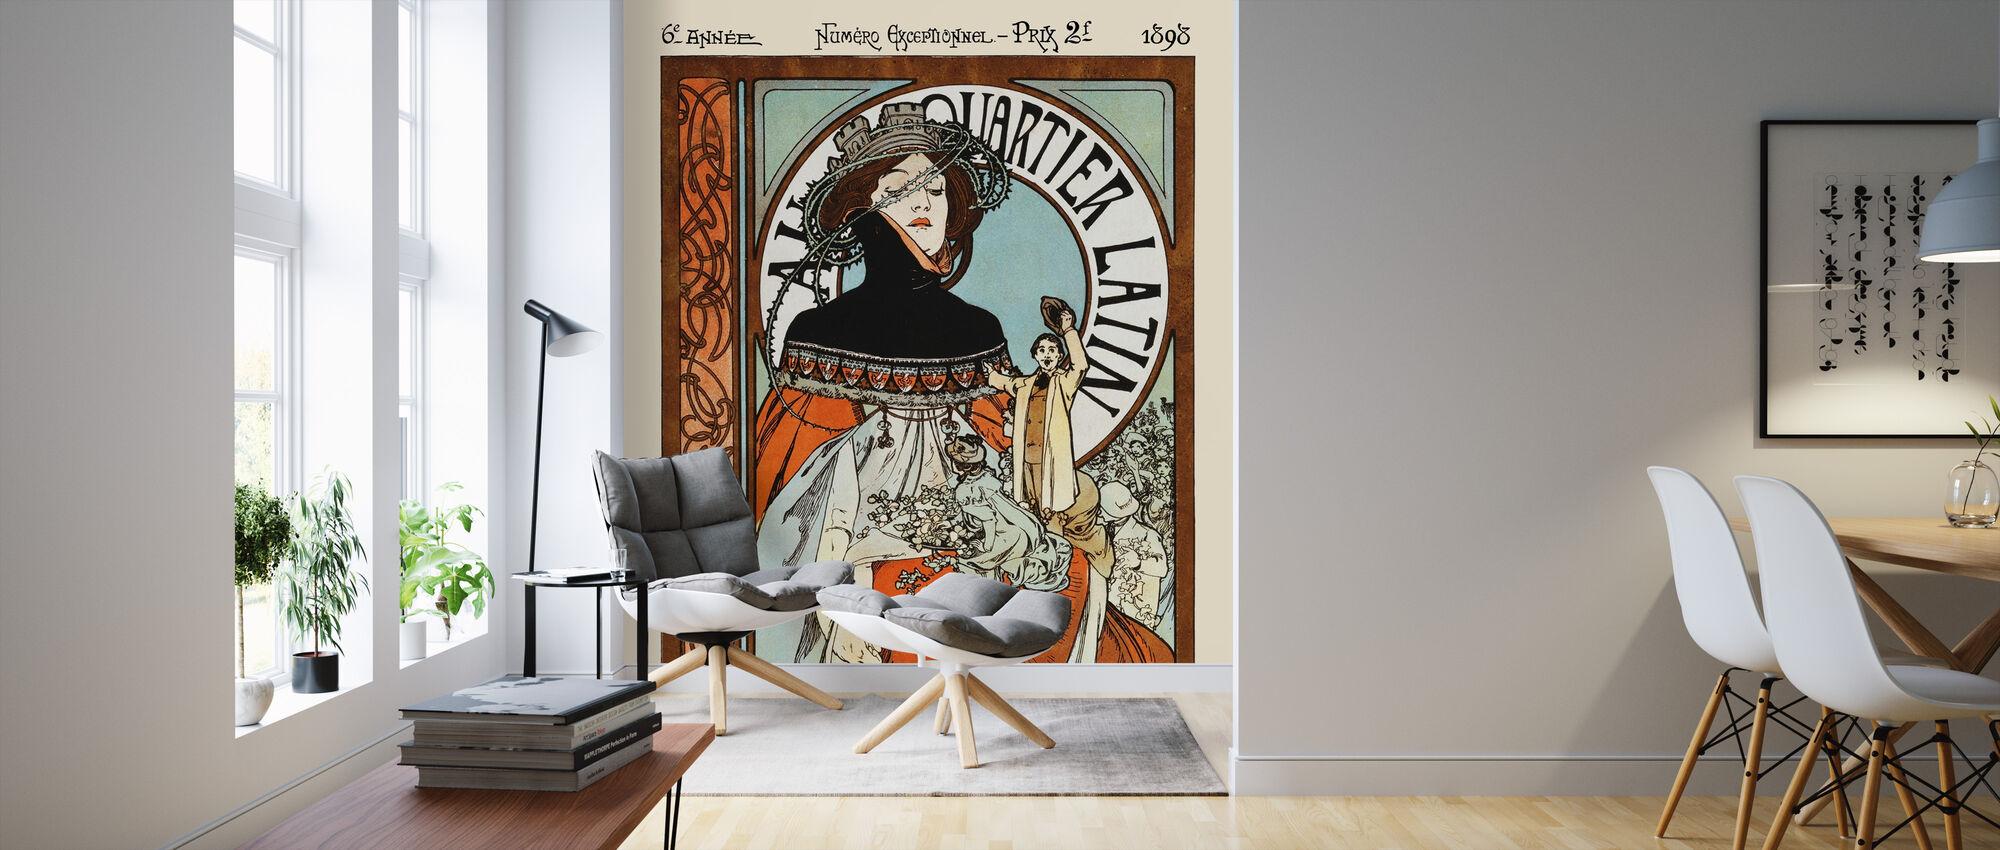 alphonse mucha au quarter latin mit fototapeten einrichten photowall. Black Bedroom Furniture Sets. Home Design Ideas